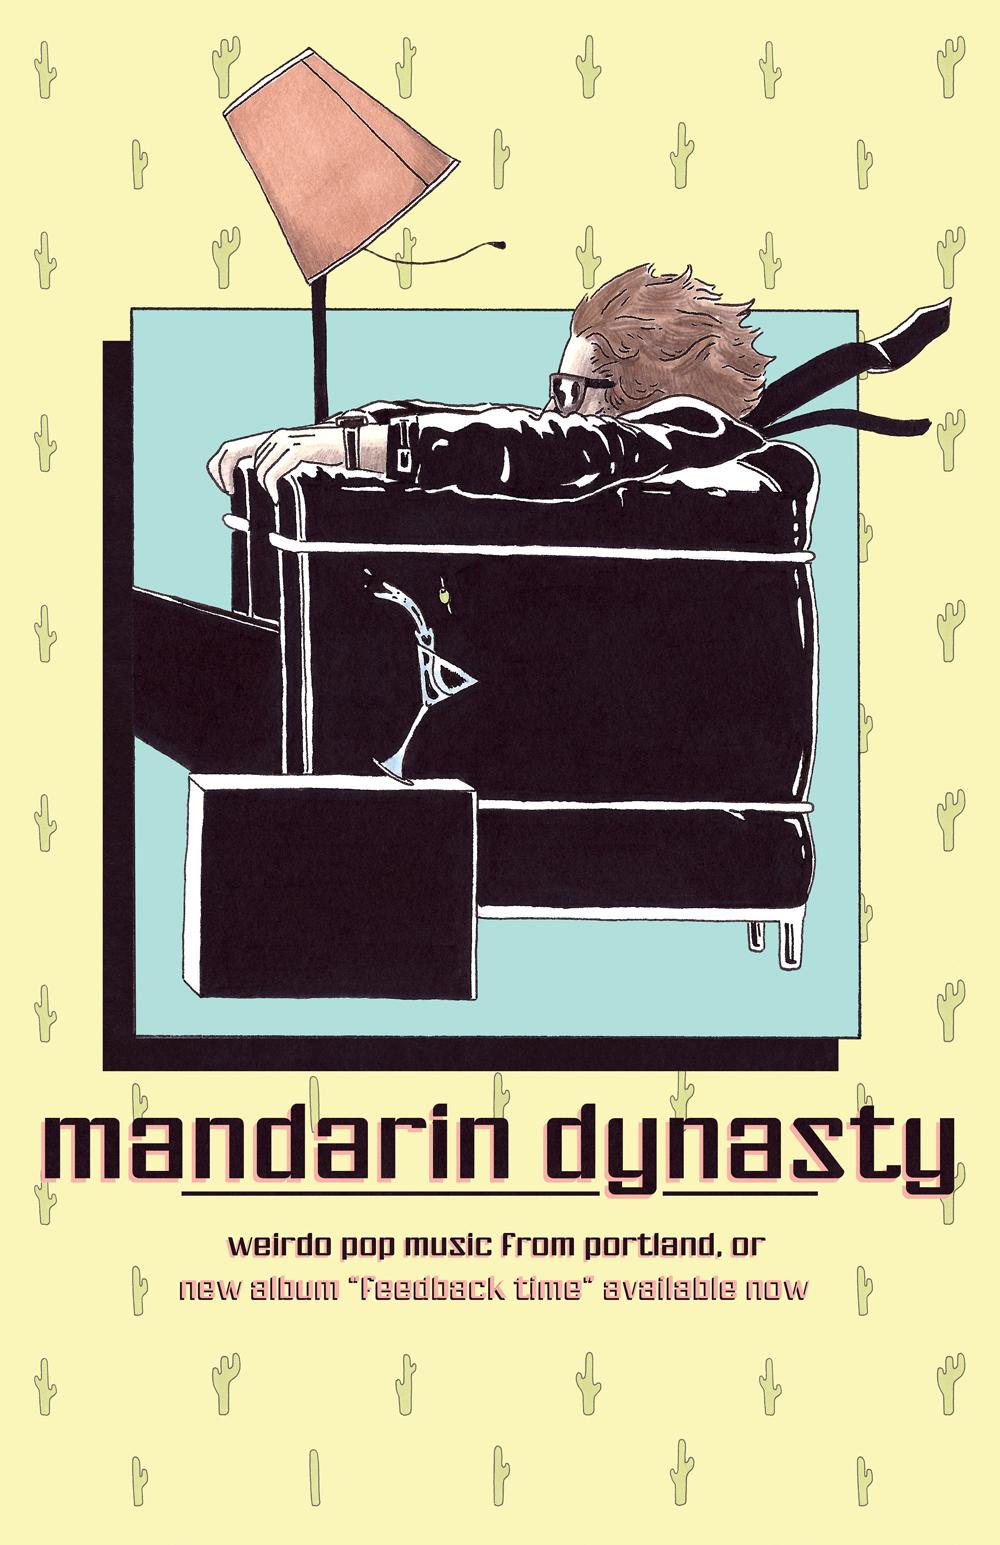 11:15 Mandarin Dynasty Poster.jpg